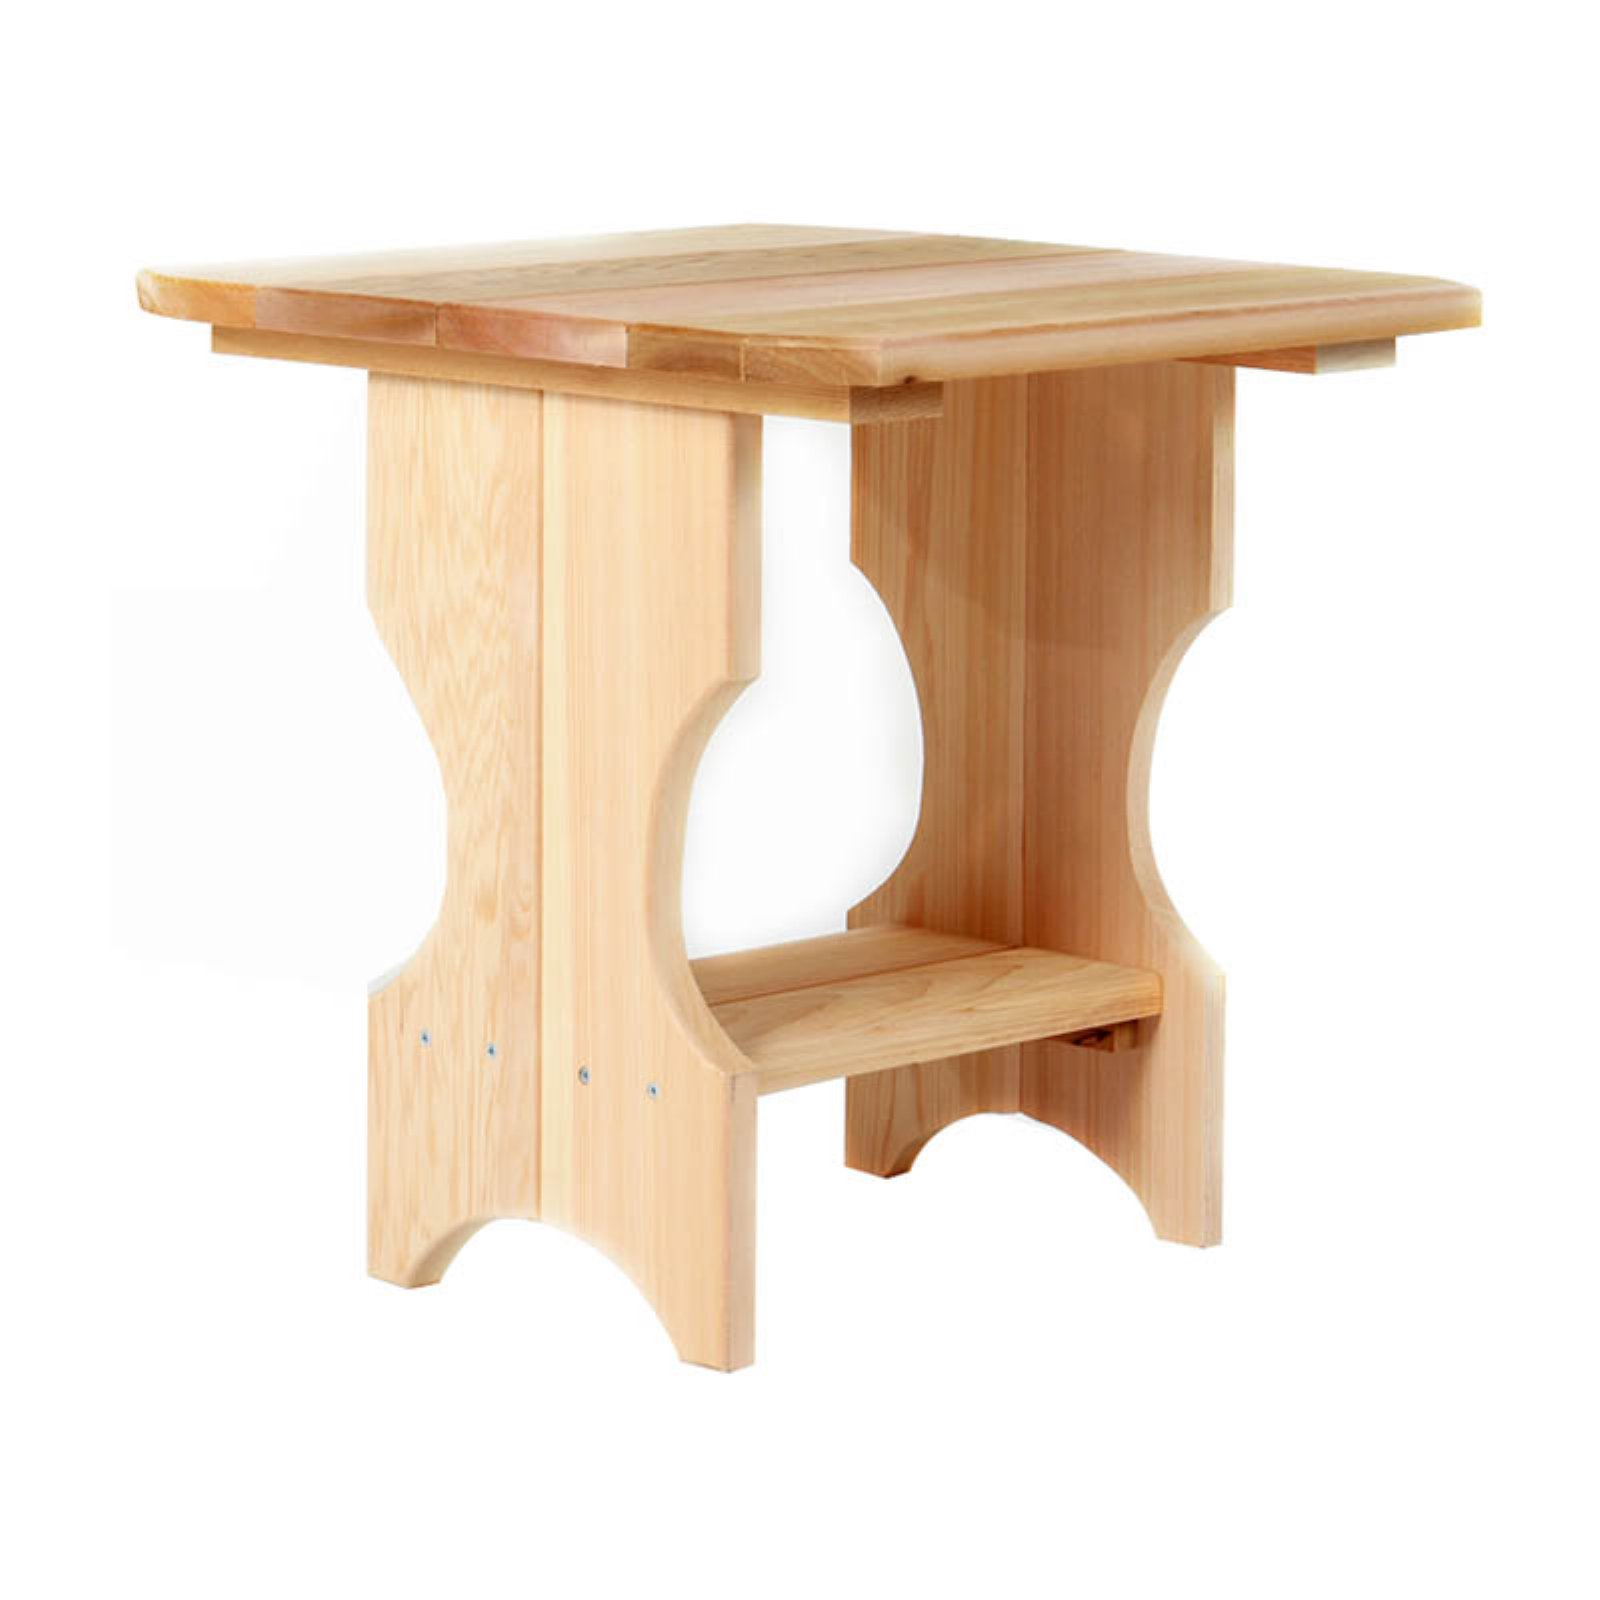 All Things Cedar Outdoor Magazine Rack Side Table - Western Red Cedar